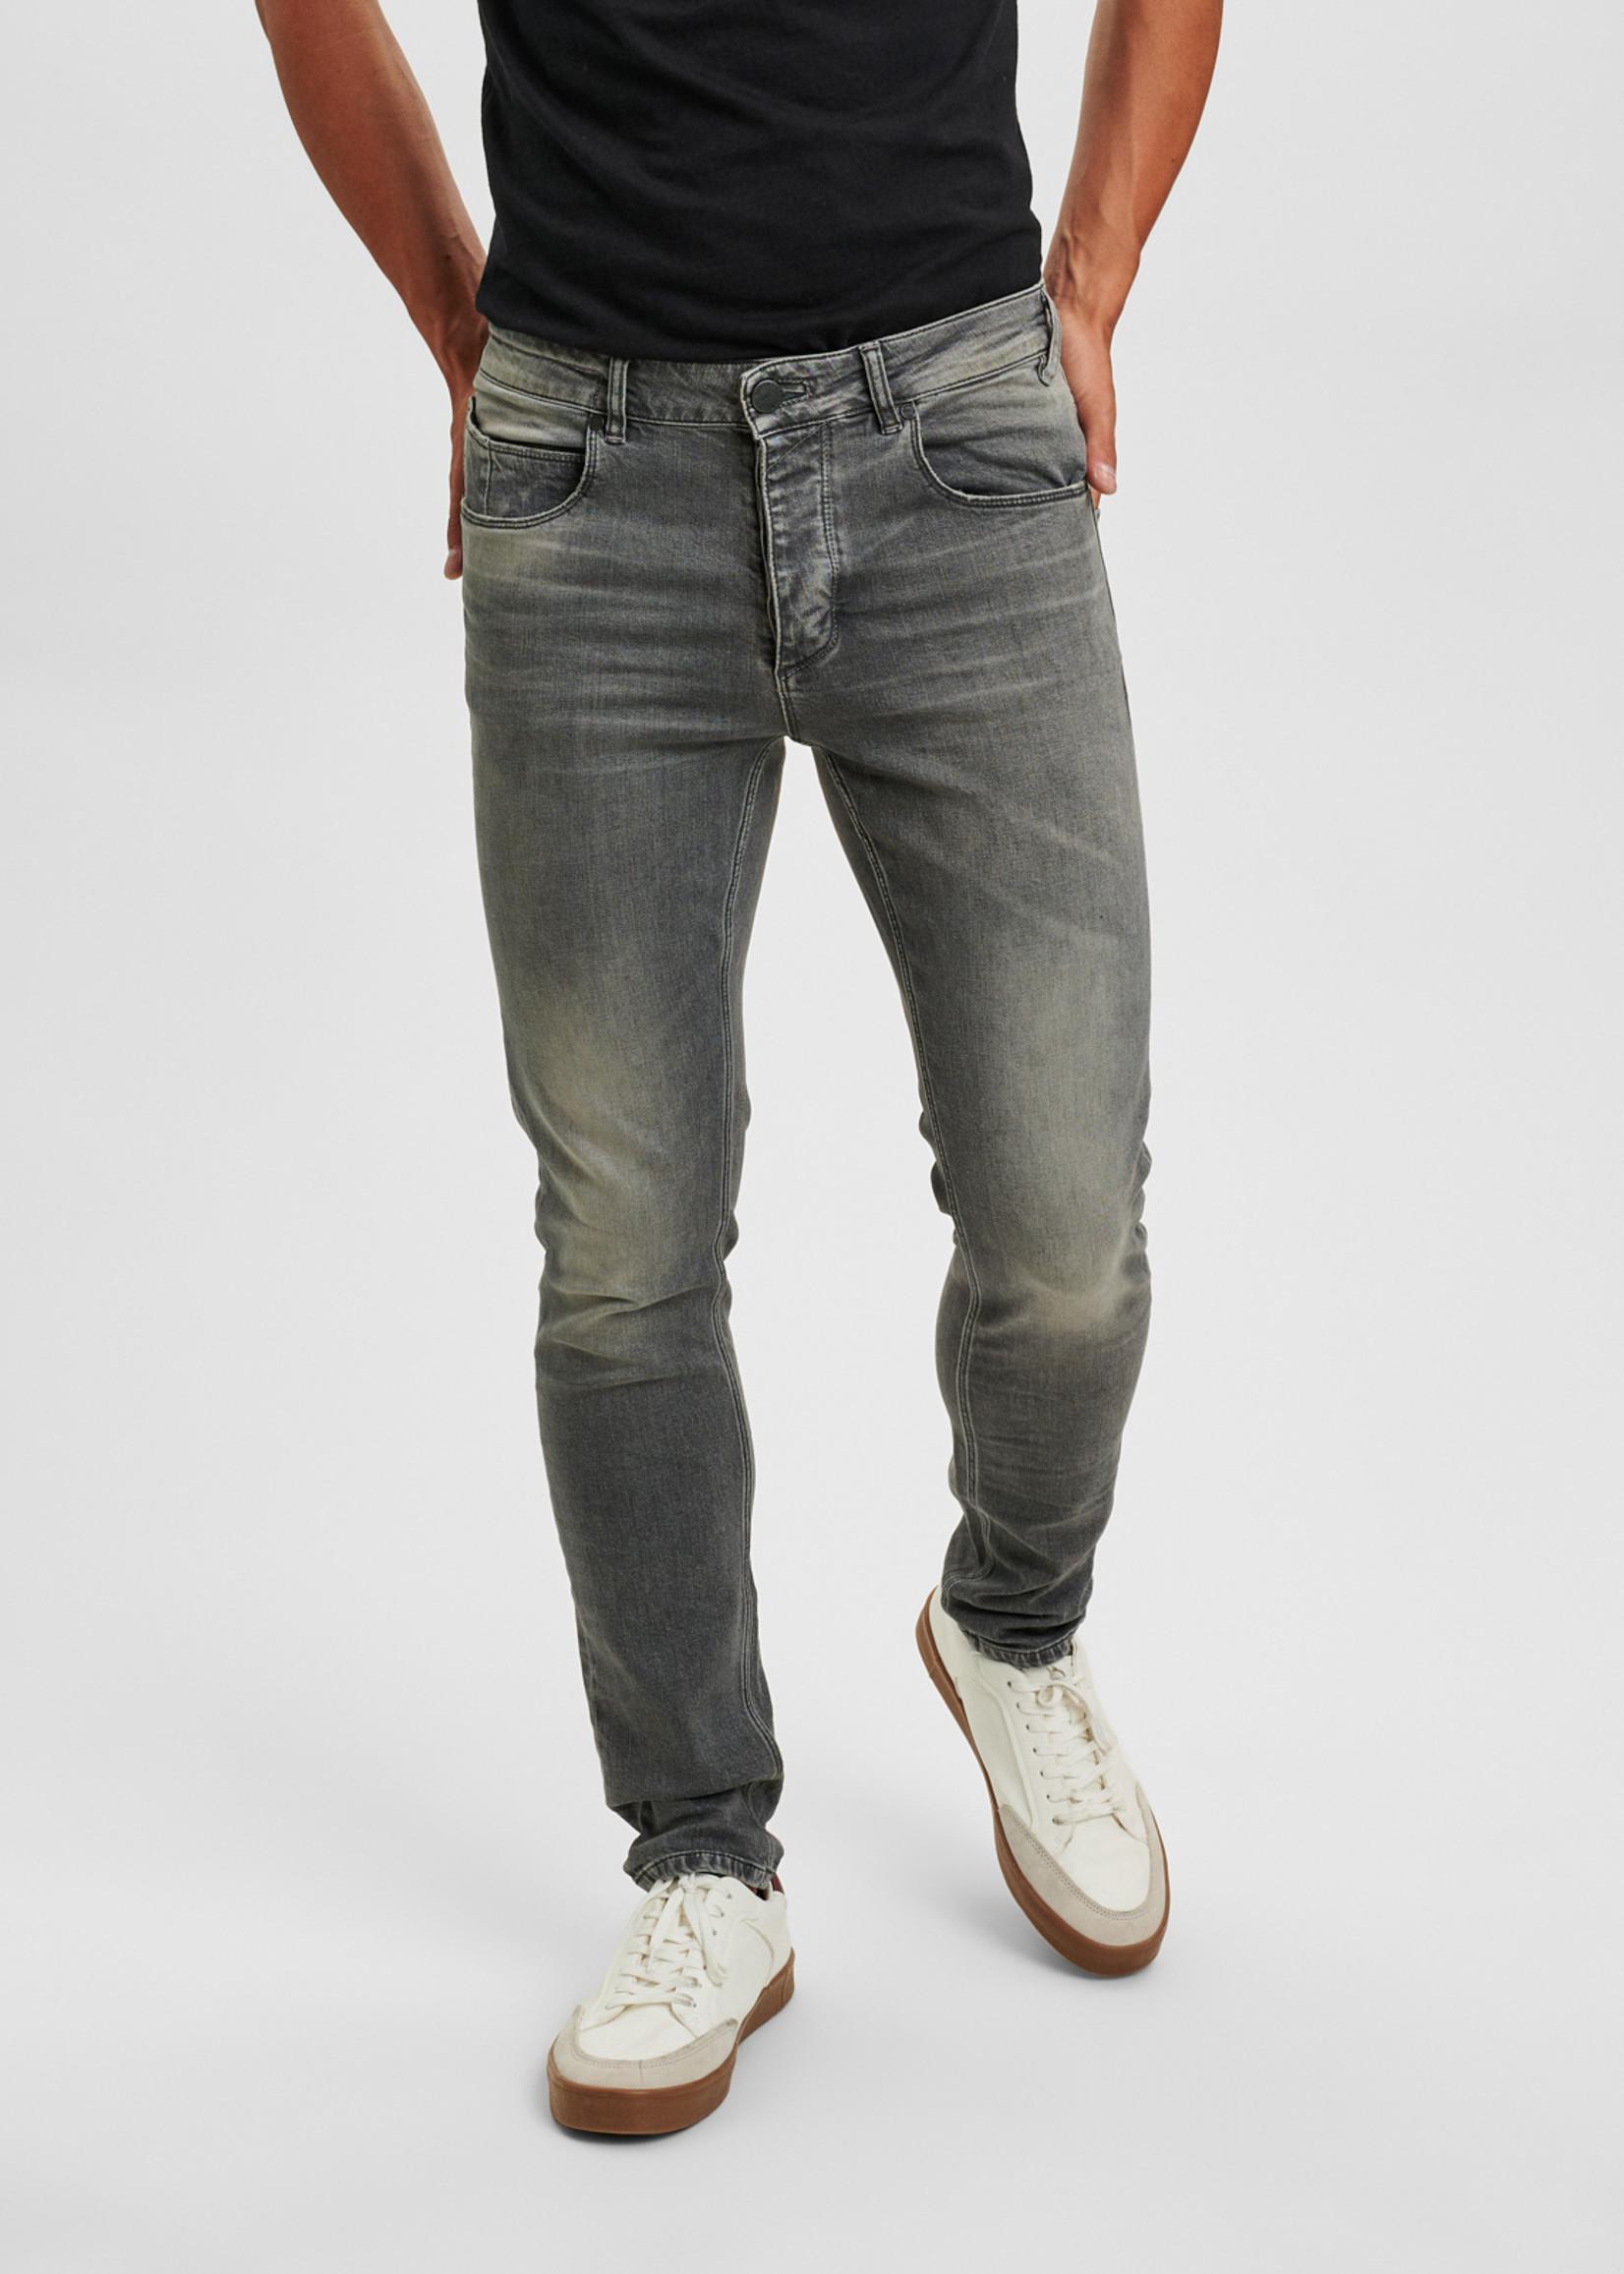 Gabba Rey K3454 Jeans